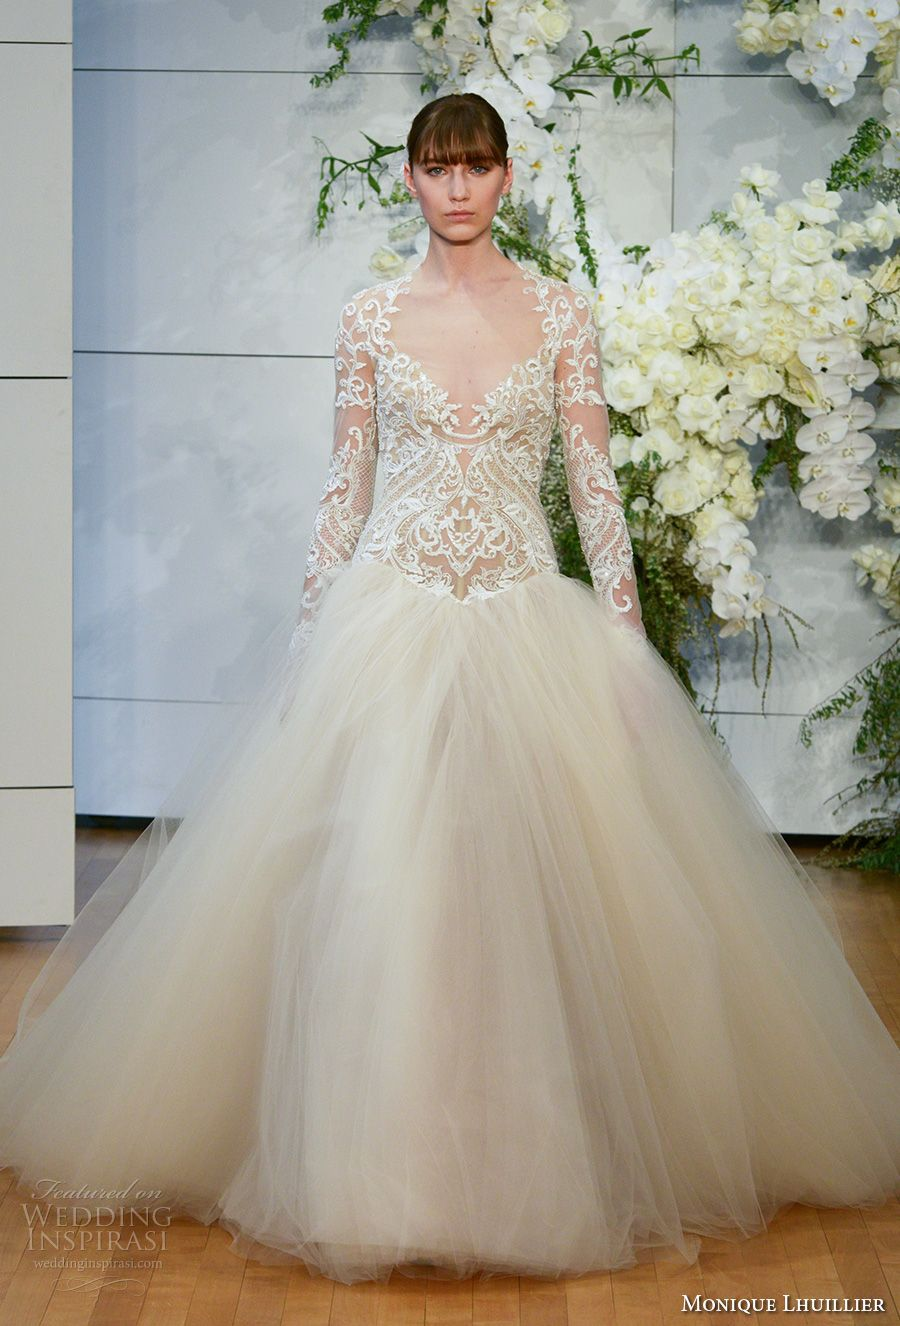 Monique lhuillier spring 2018 wedding dresses new york for Monique lhuillier brooke wedding dress